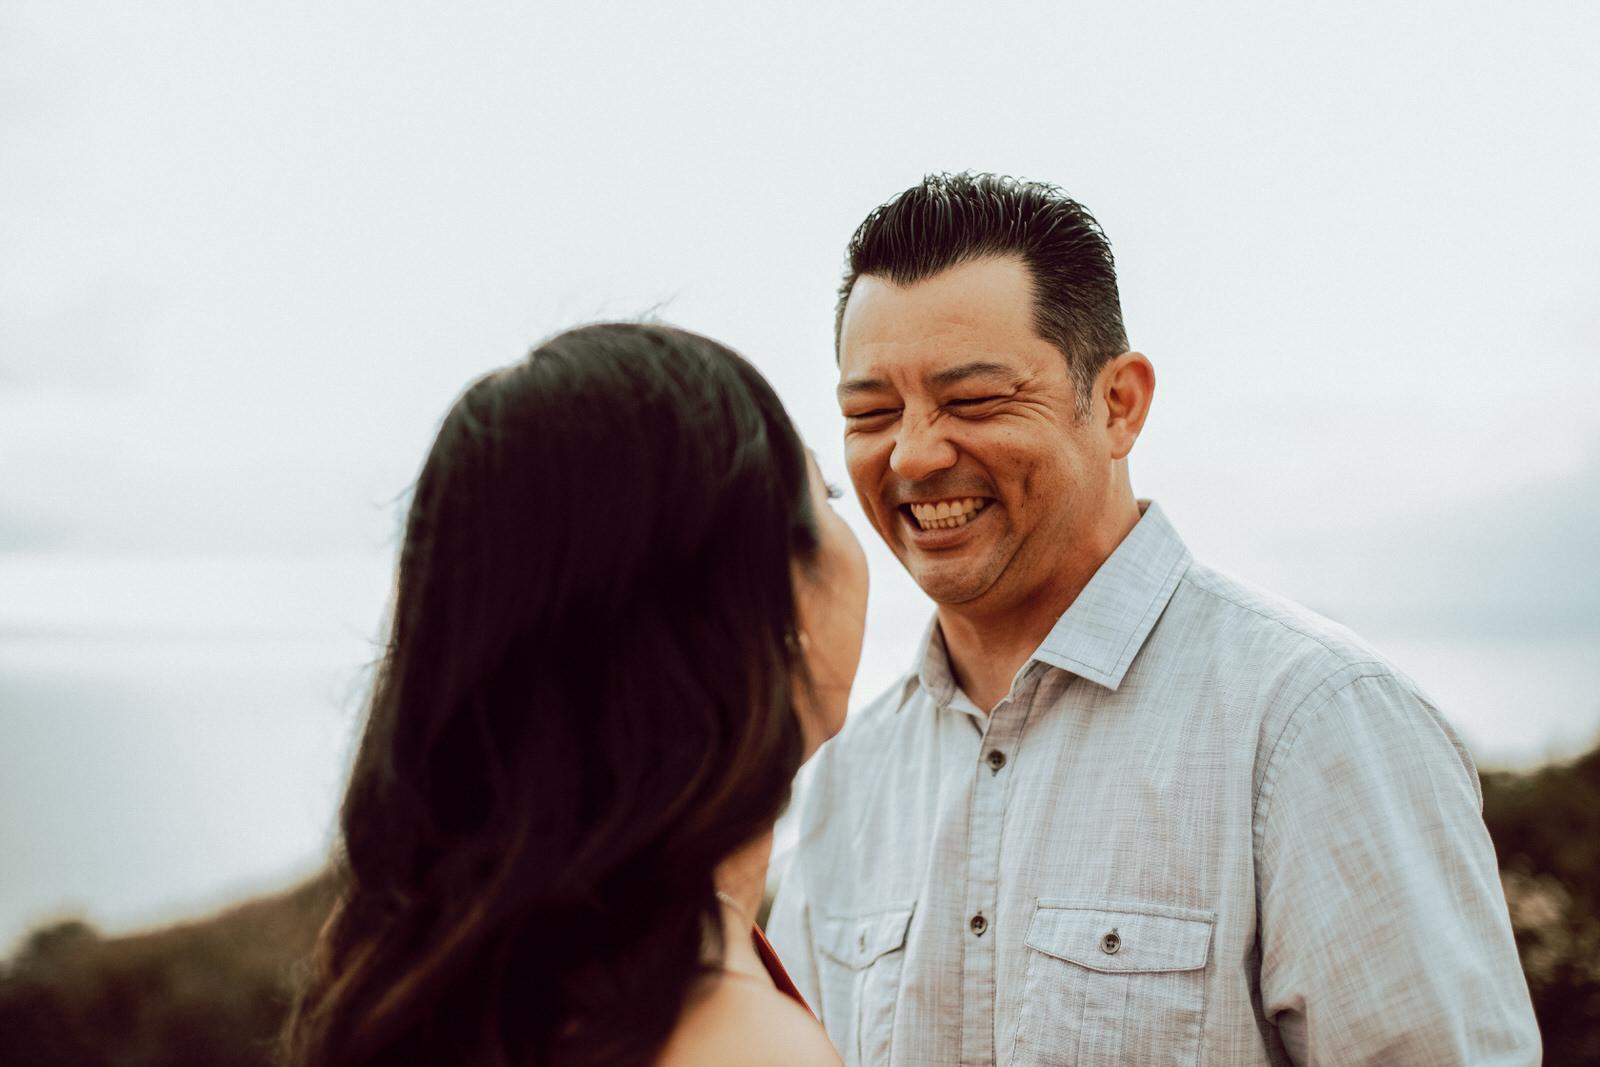 A tall man smiling at his girlfriend